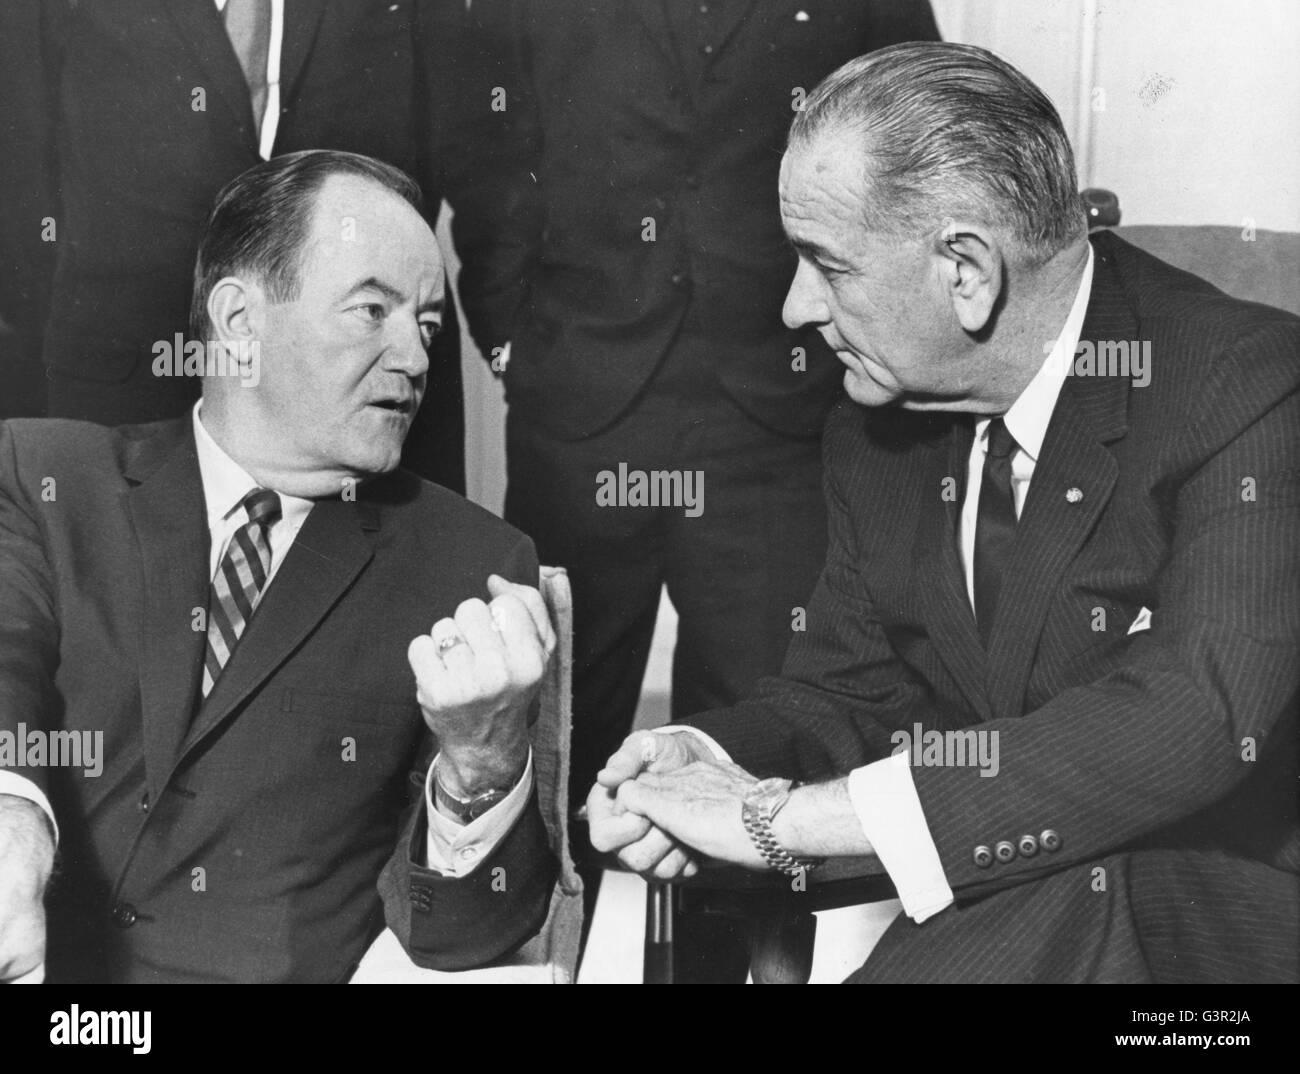 President Lyndon B. Johnson listens to Vice-President Hubert H. Humphrey's report of his five-day Far East tour. - Stock Image